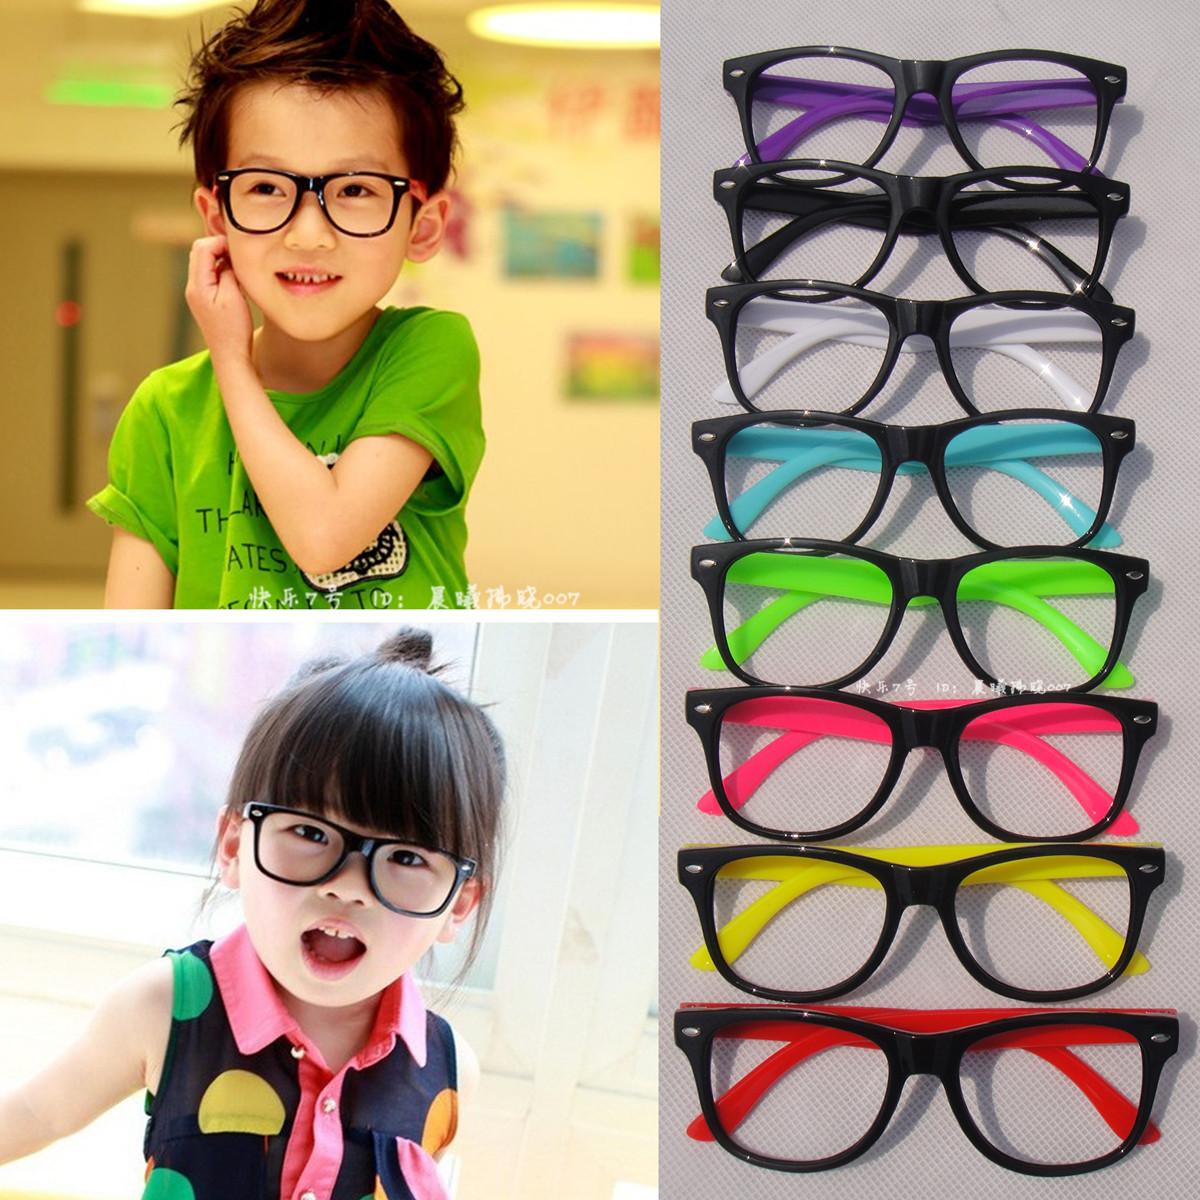 Black Frame Glasses For Babies : Free shipping KIDS Boys Girls COOL Oversize CUTE Black ...